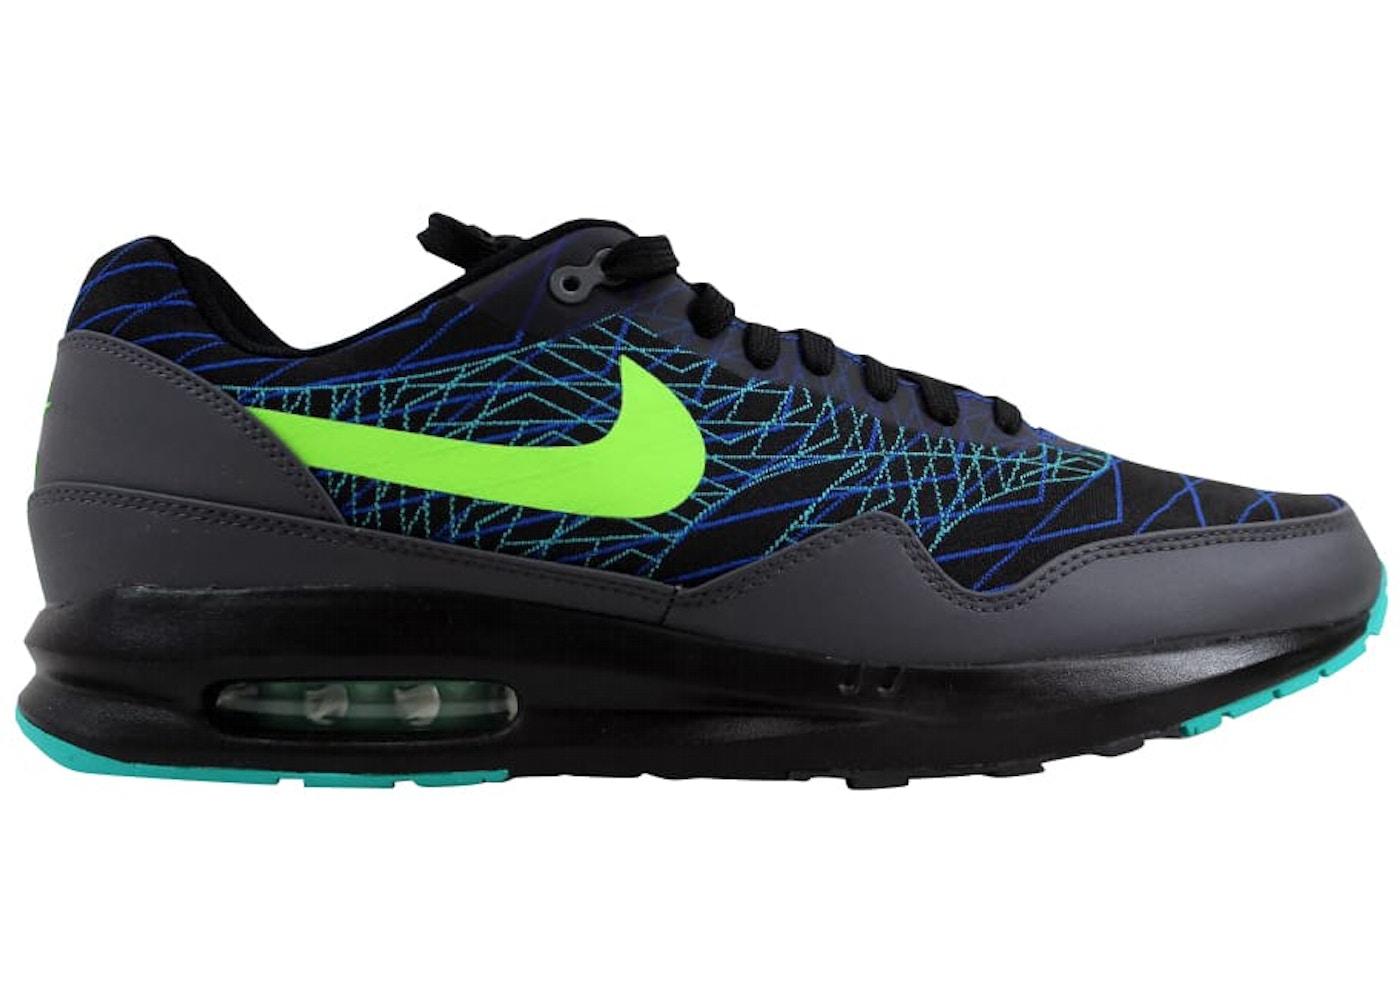 reputable site 1aaf2 ba231 Nike Air Max Lunar1 JCRD Winter Black Flash Lime-Hyper Cobalt ...